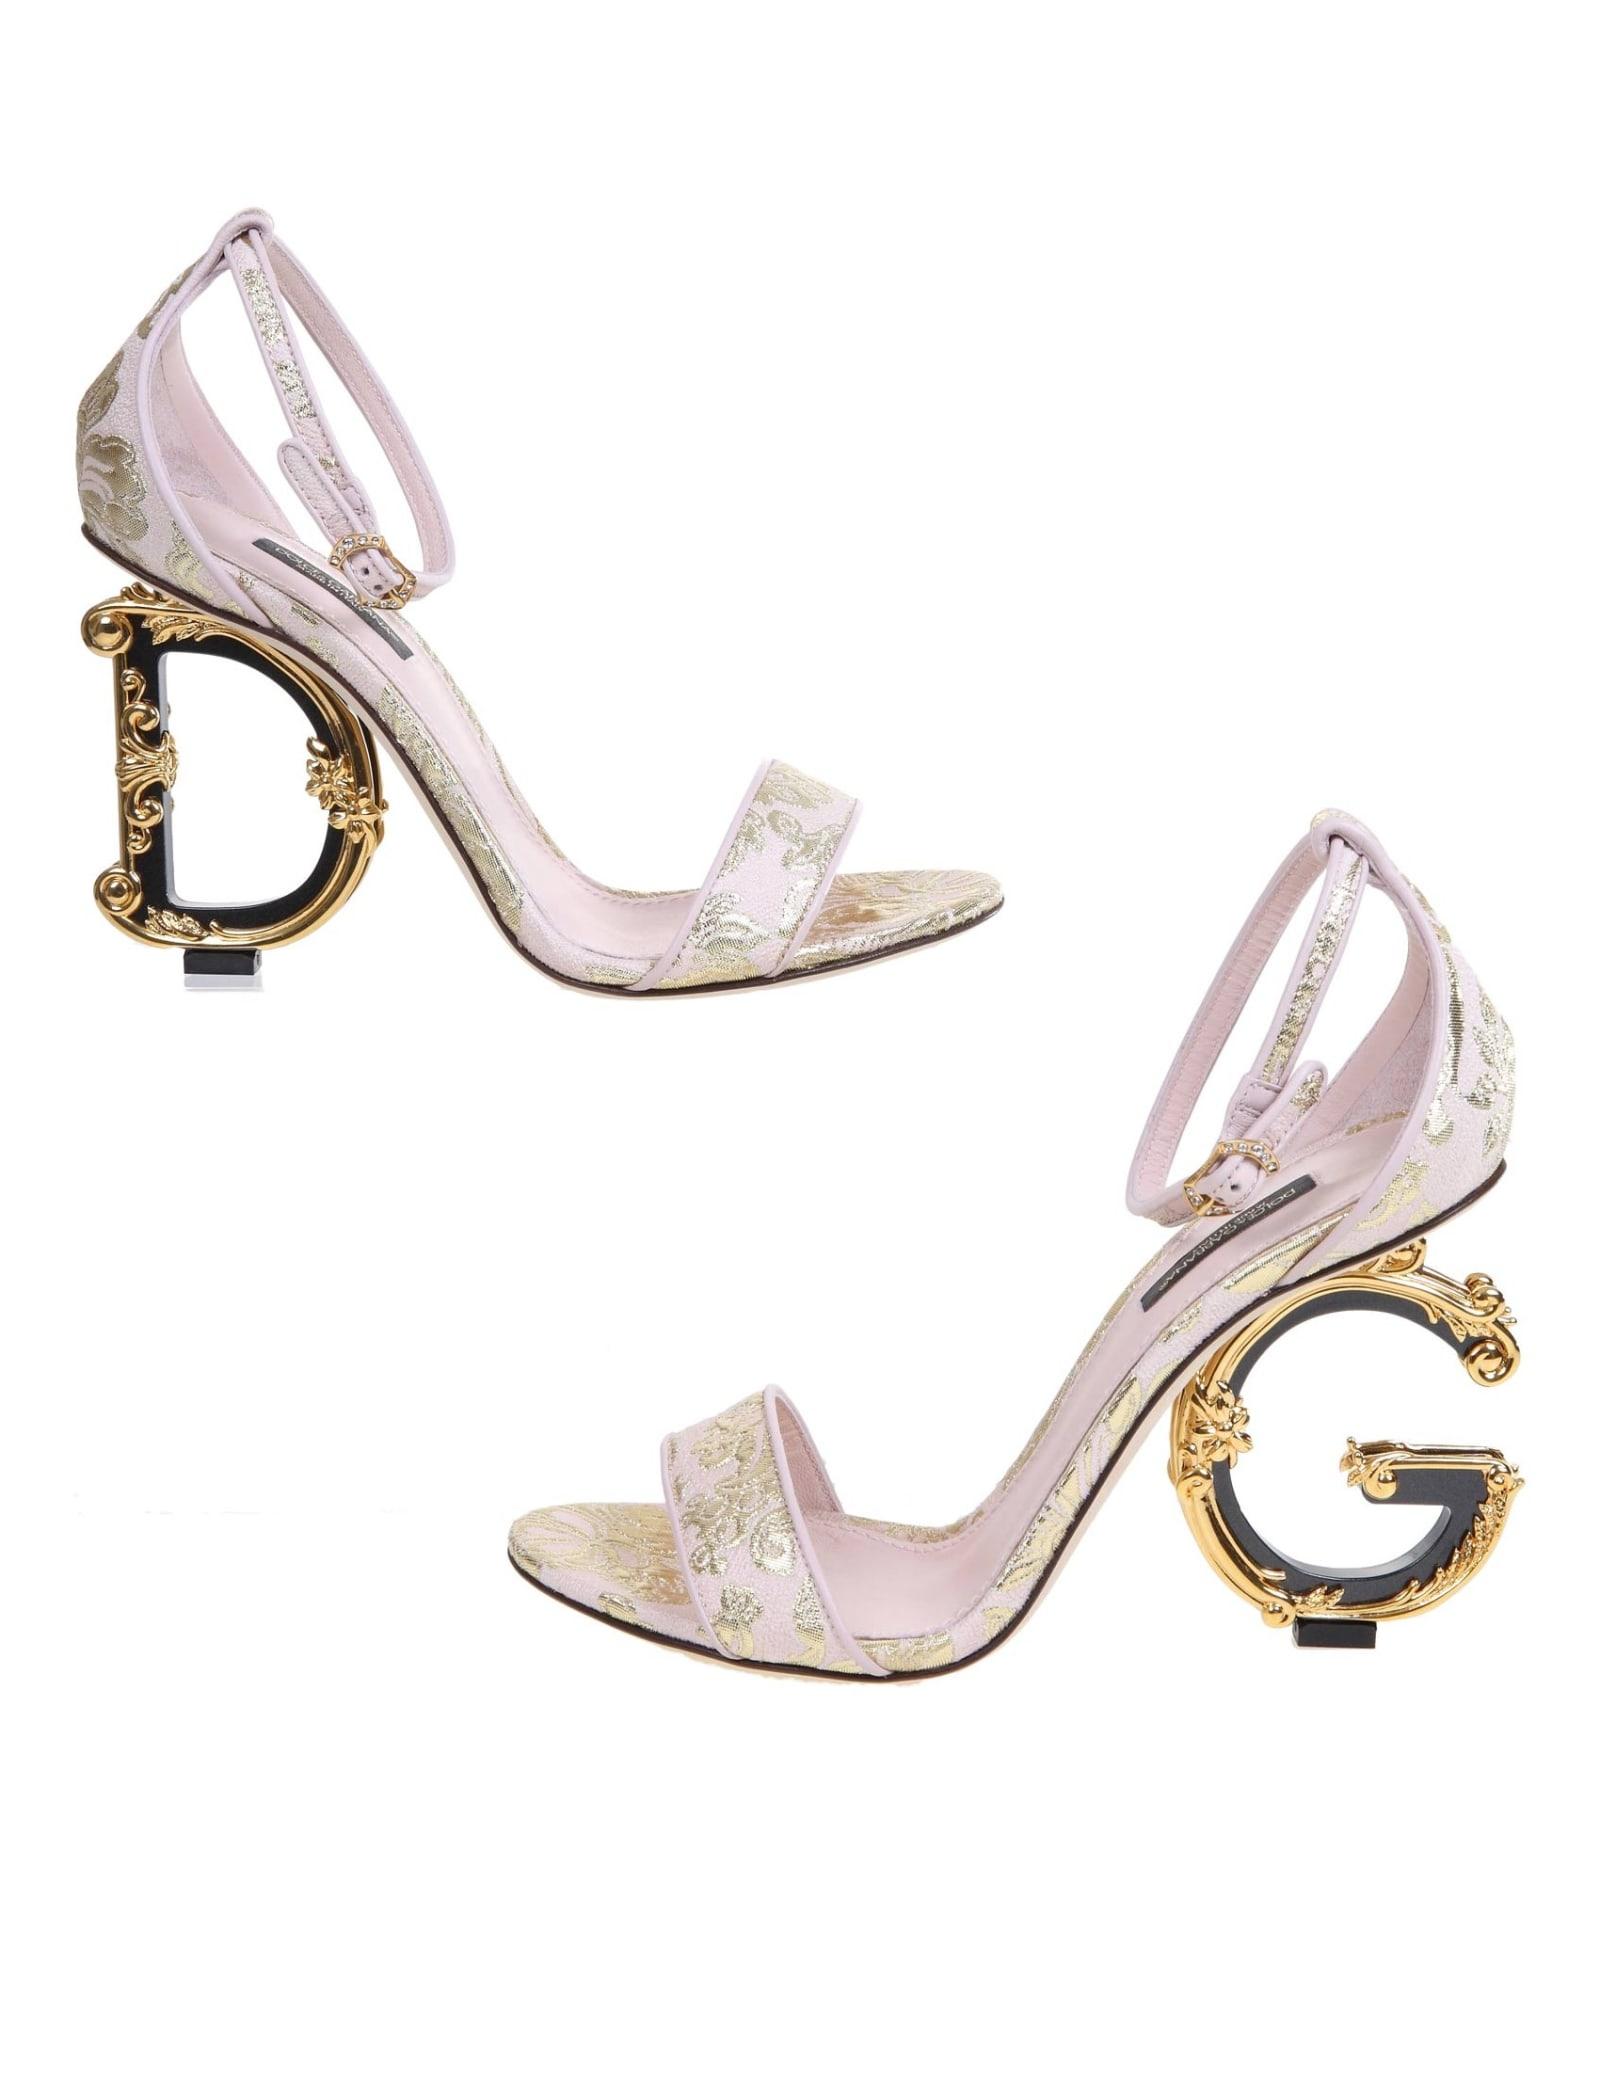 Dolce & Gabbana KEIRA SANDAL IN PINK BROCADE FABRIC